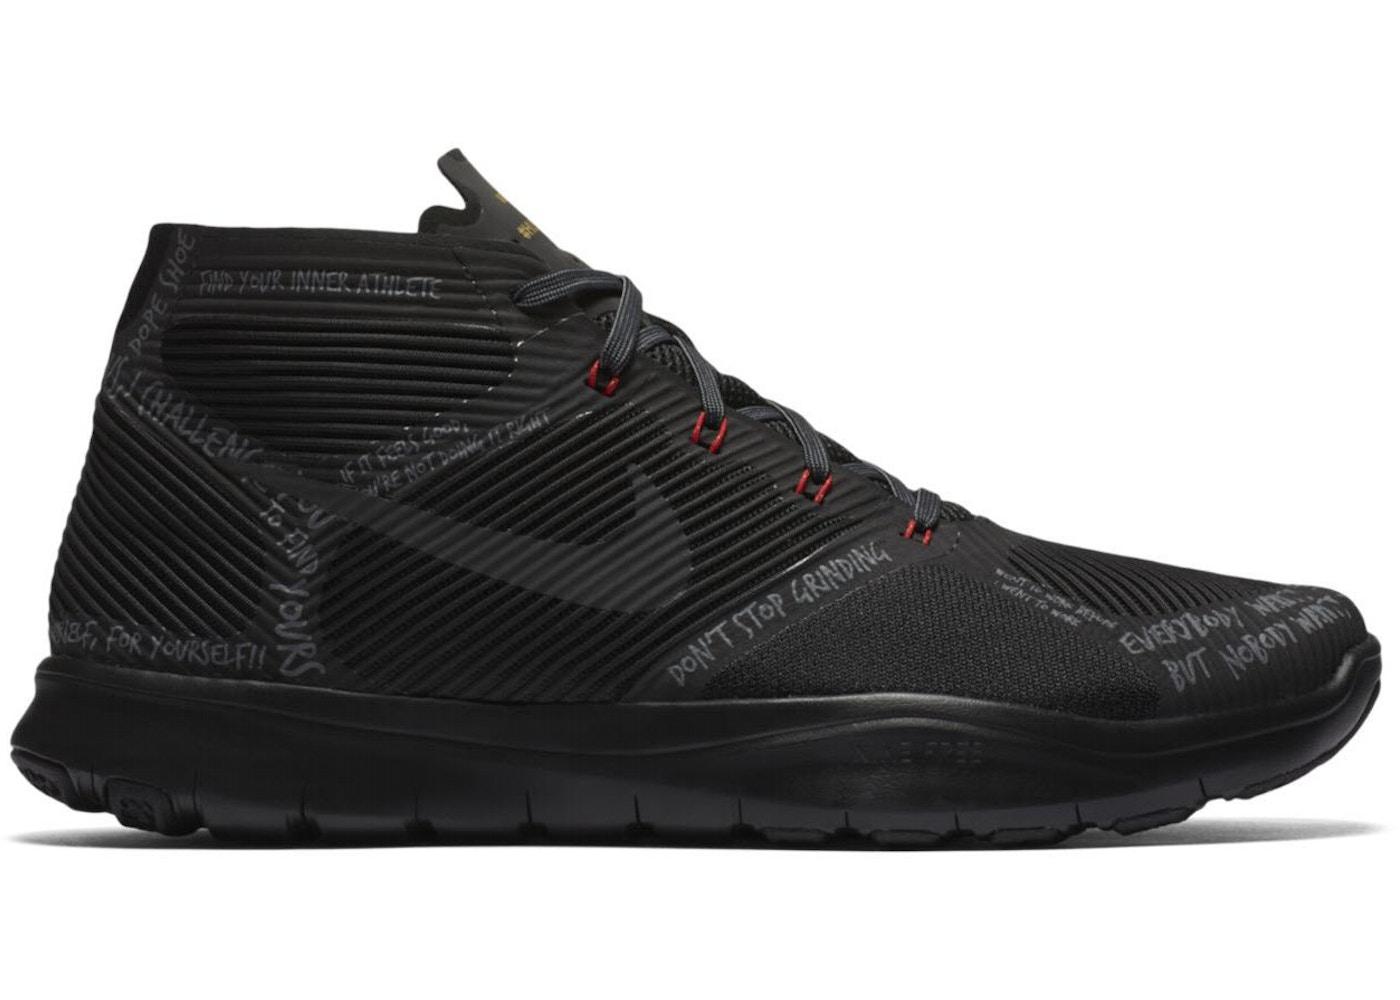 Nike Free Train Instinct Hustle Hart Black - 848416-001 e6619a69f